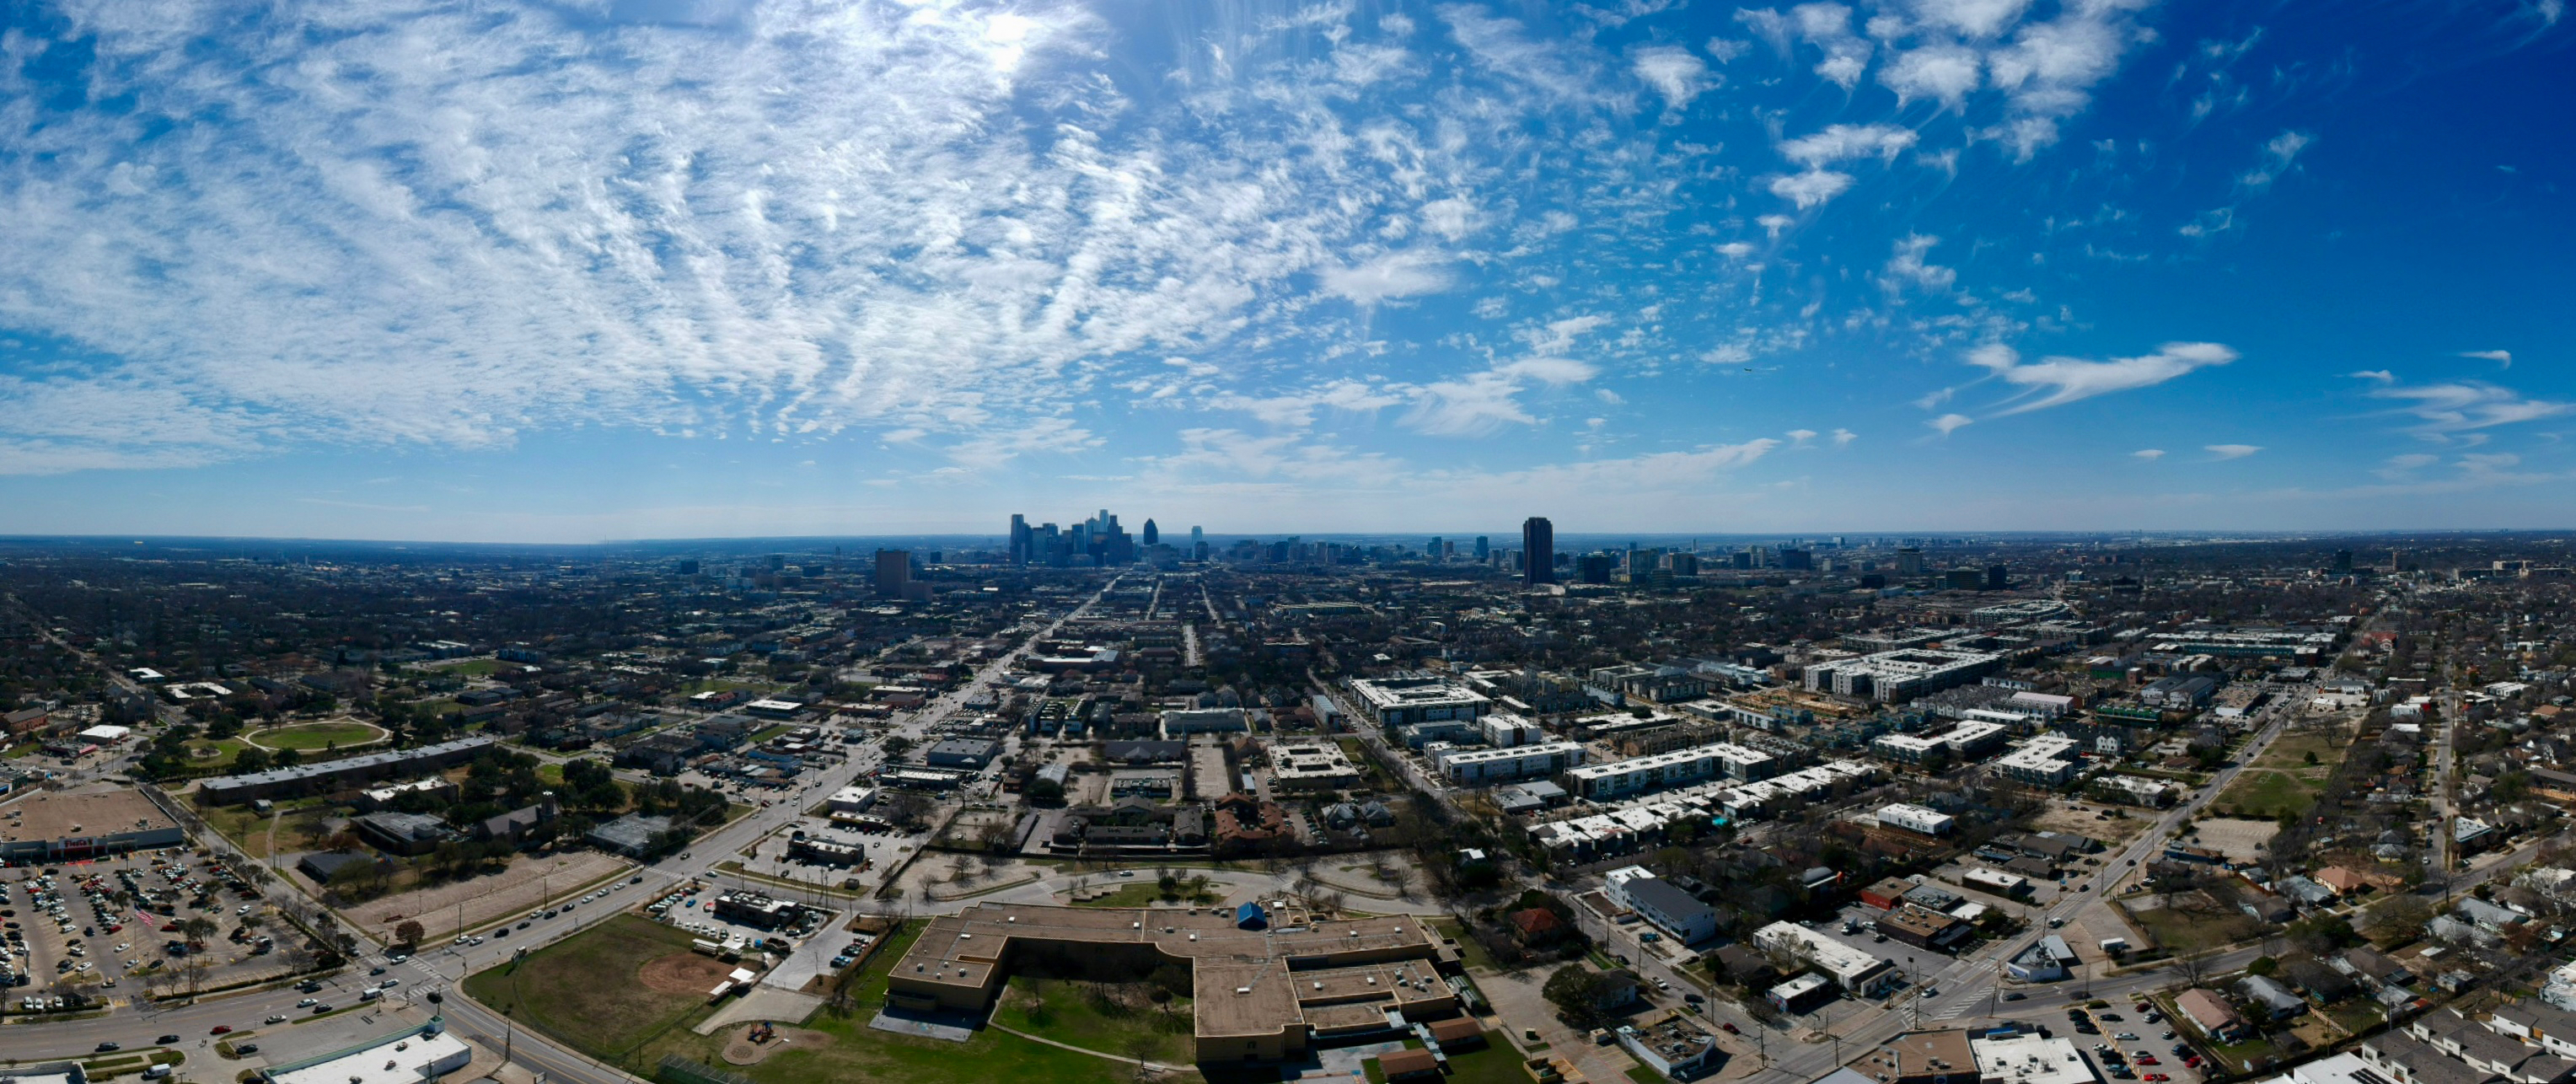 Status: Dallas Skyline